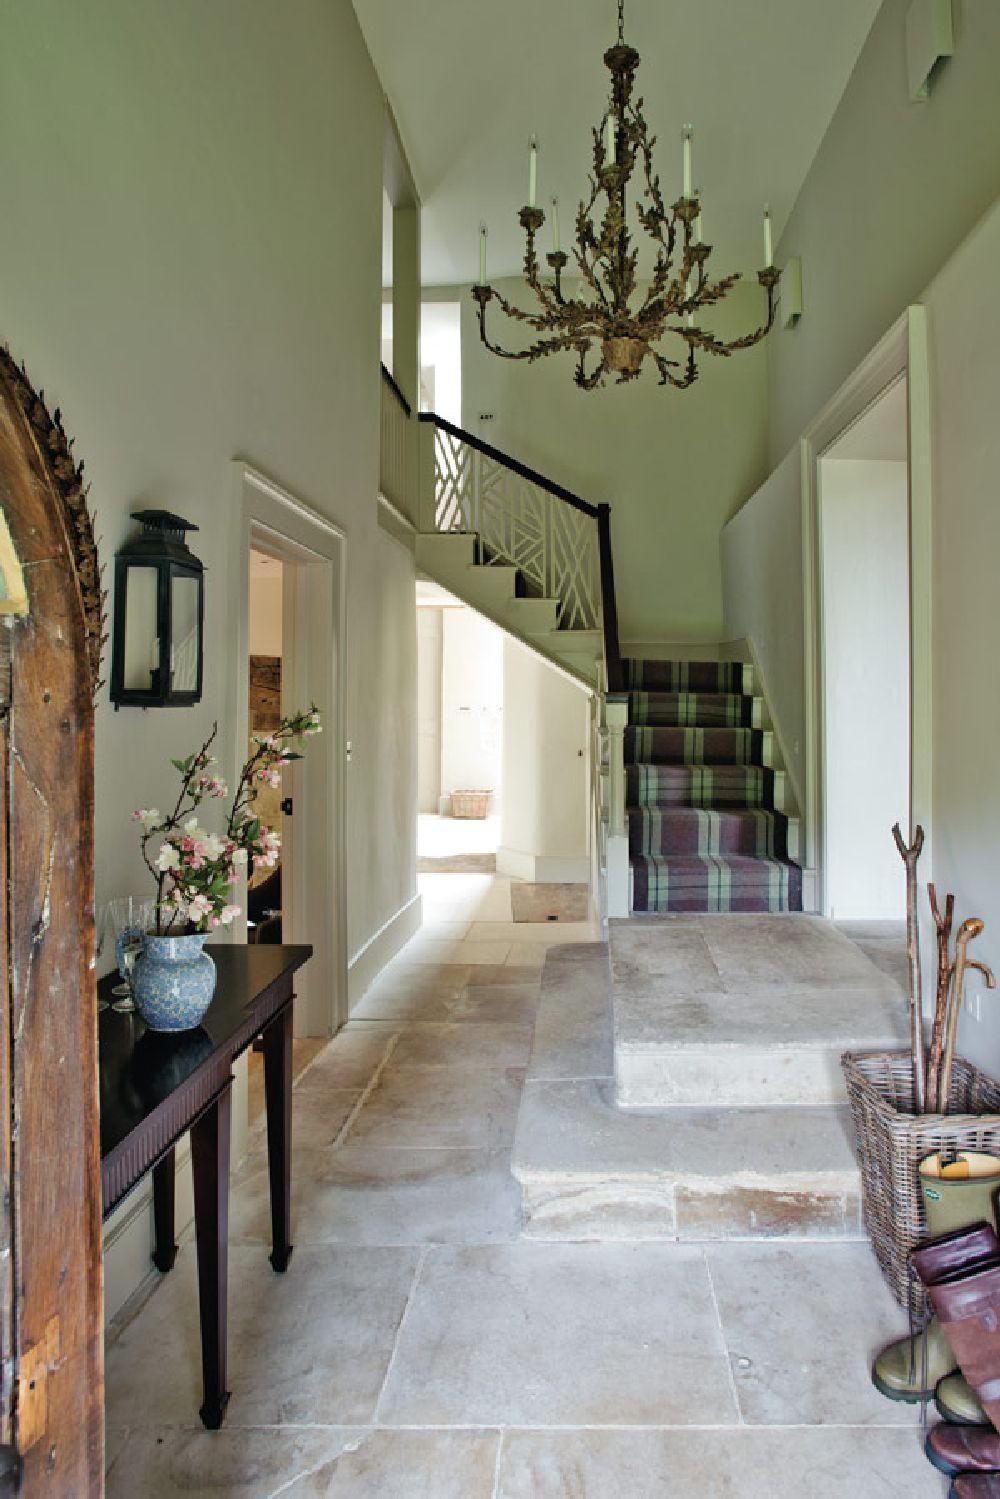 adelaparvu.com despre casa veche Anglia decorata in pasteluri, Design Interior Sims Hilditch Interior Design, Dorset Manor House, Foto Polly Eltes (8)